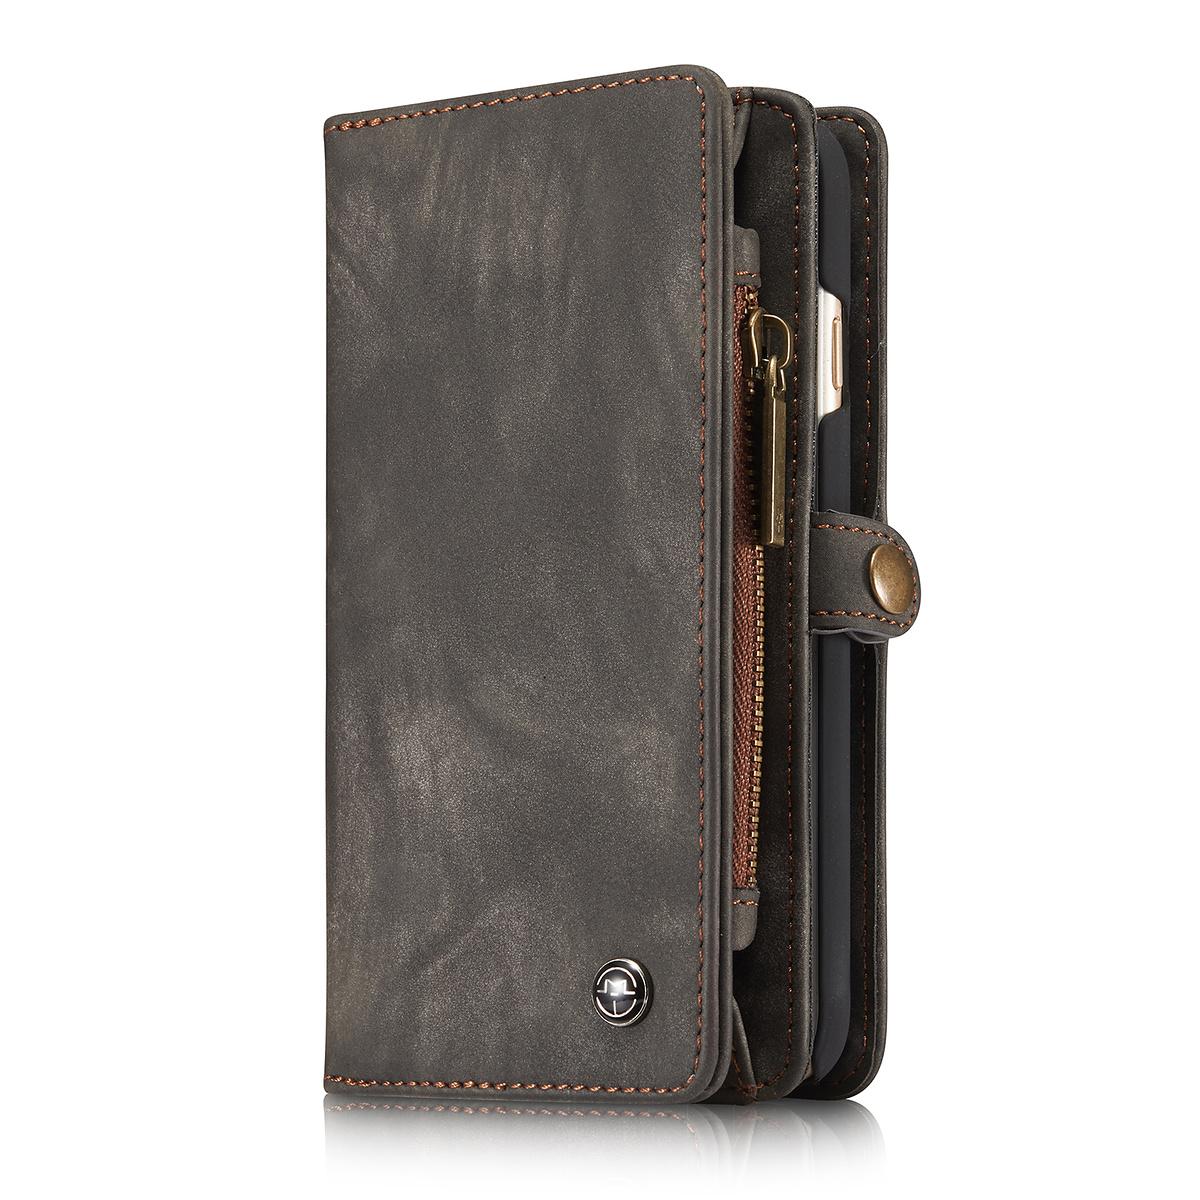 CaseMe plånboksfodral med magnetskal till iPhone 6/6S, svart